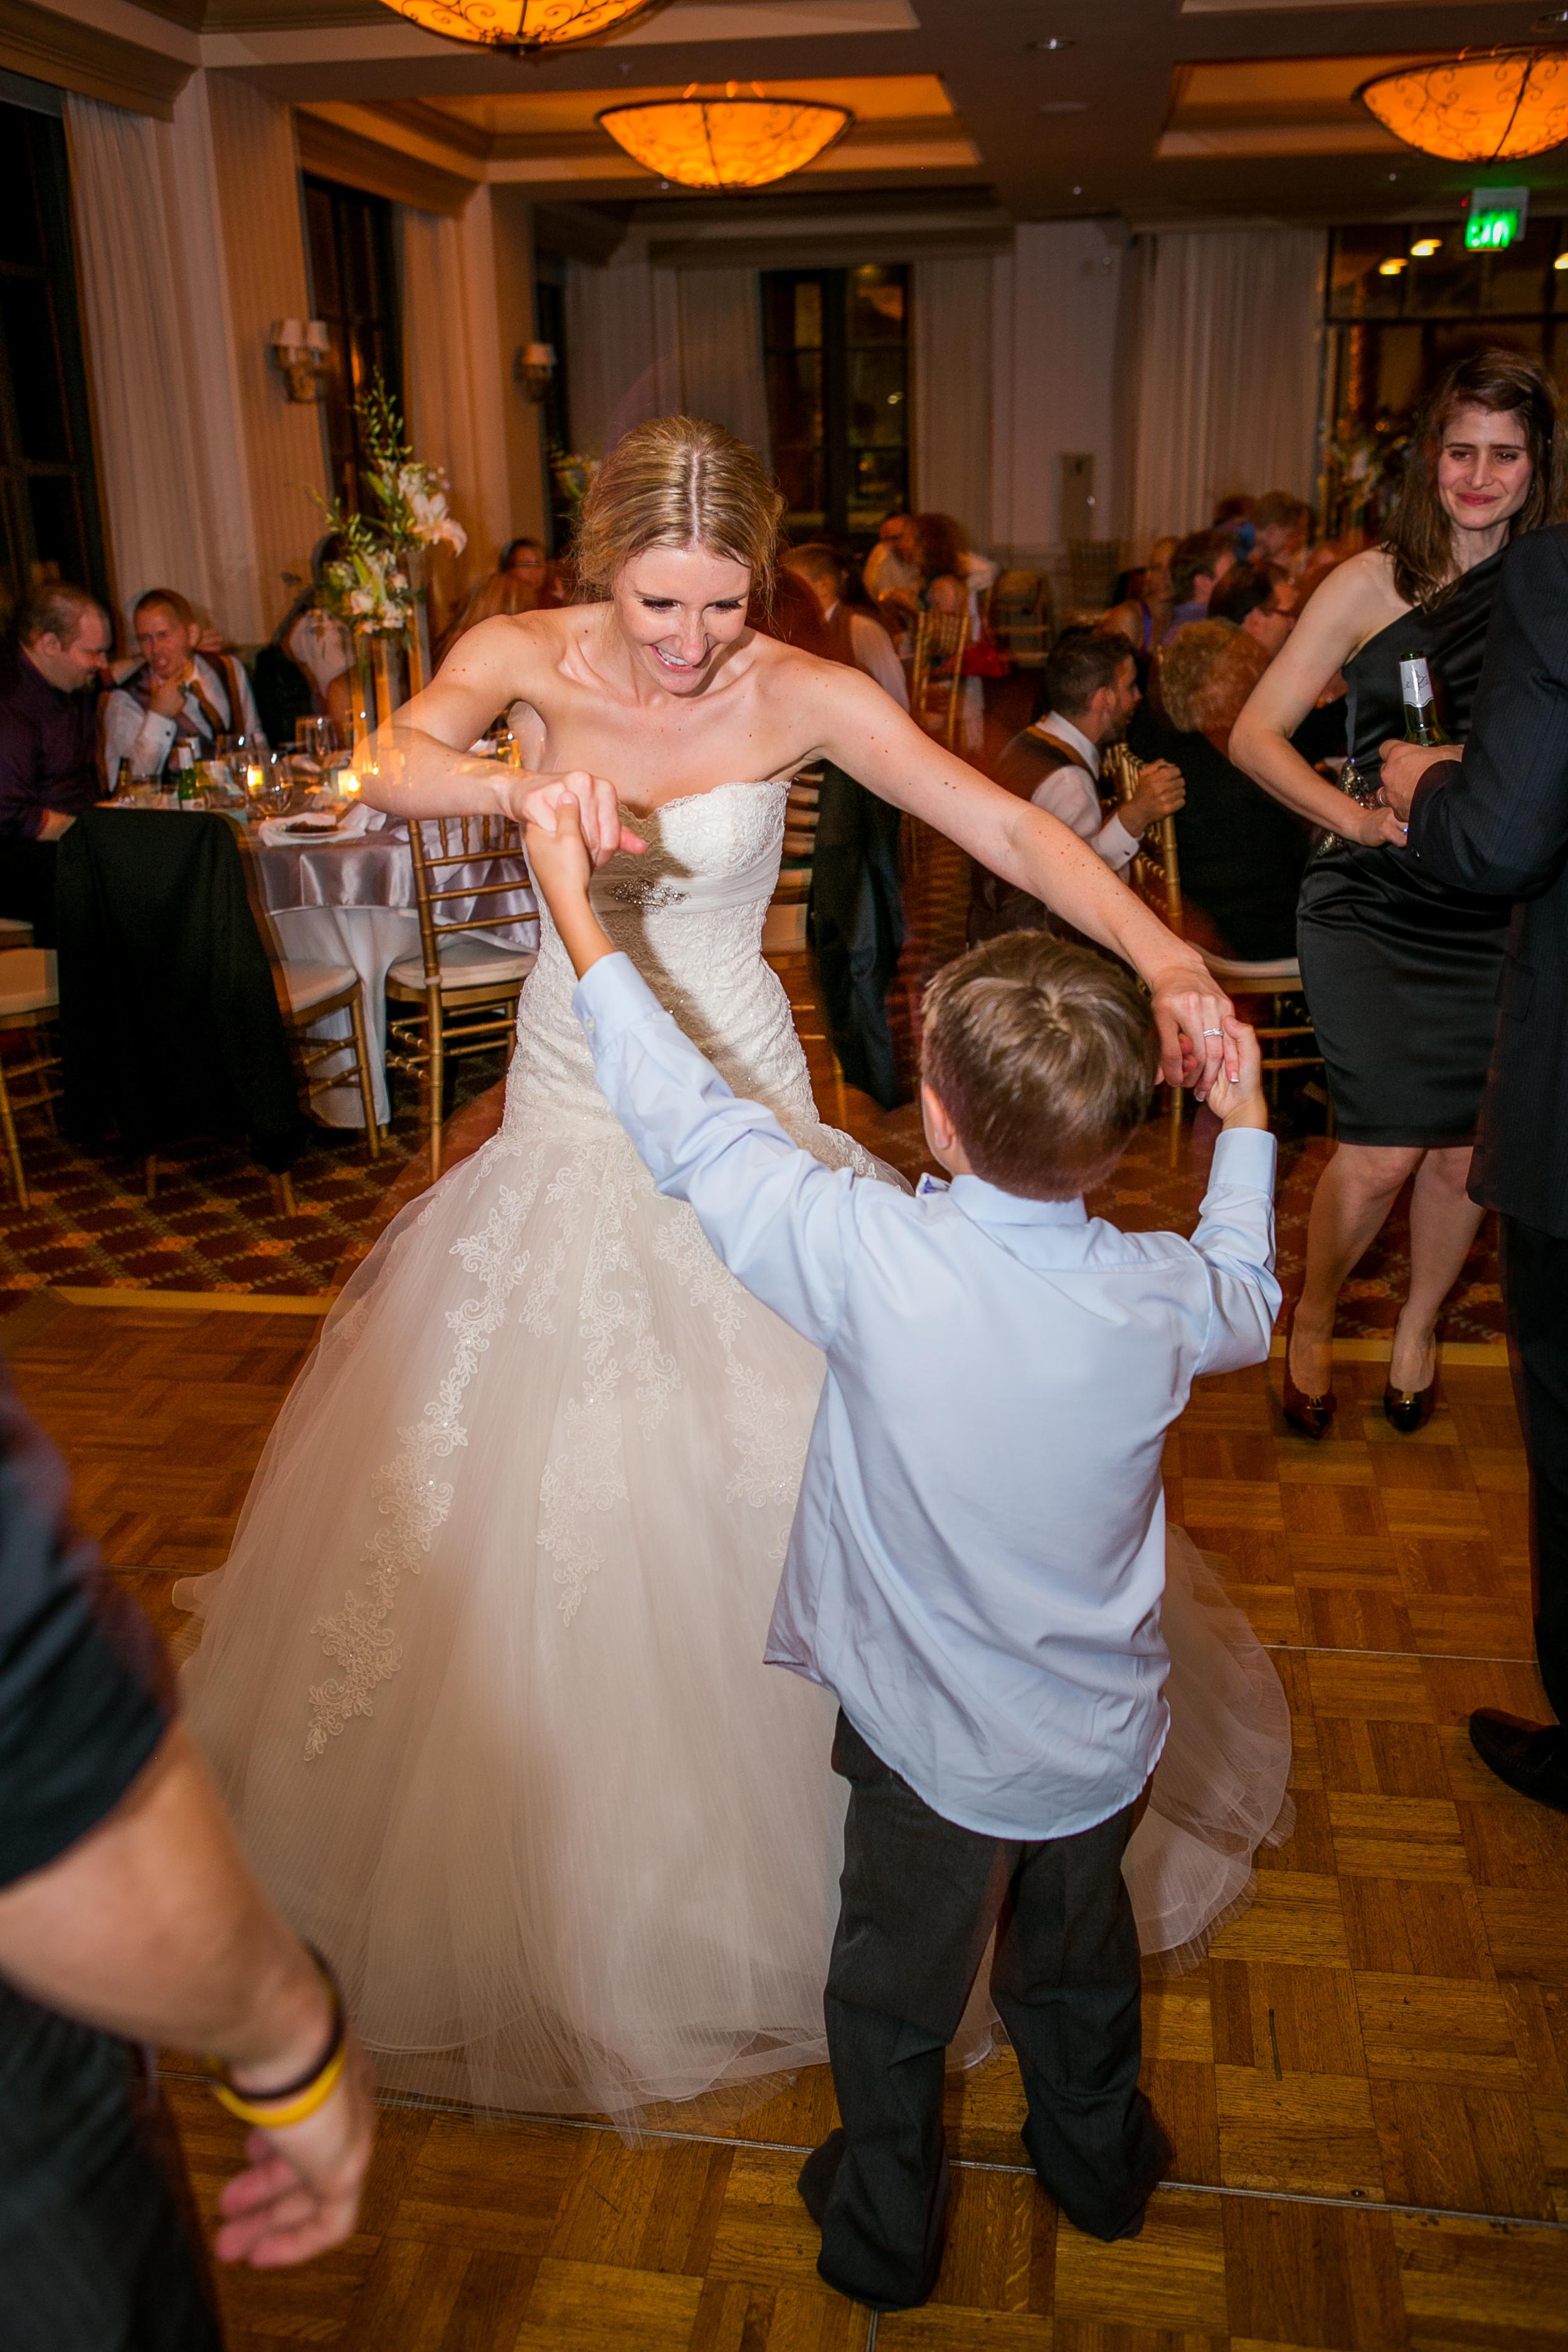 wording wedding invitations for no kids